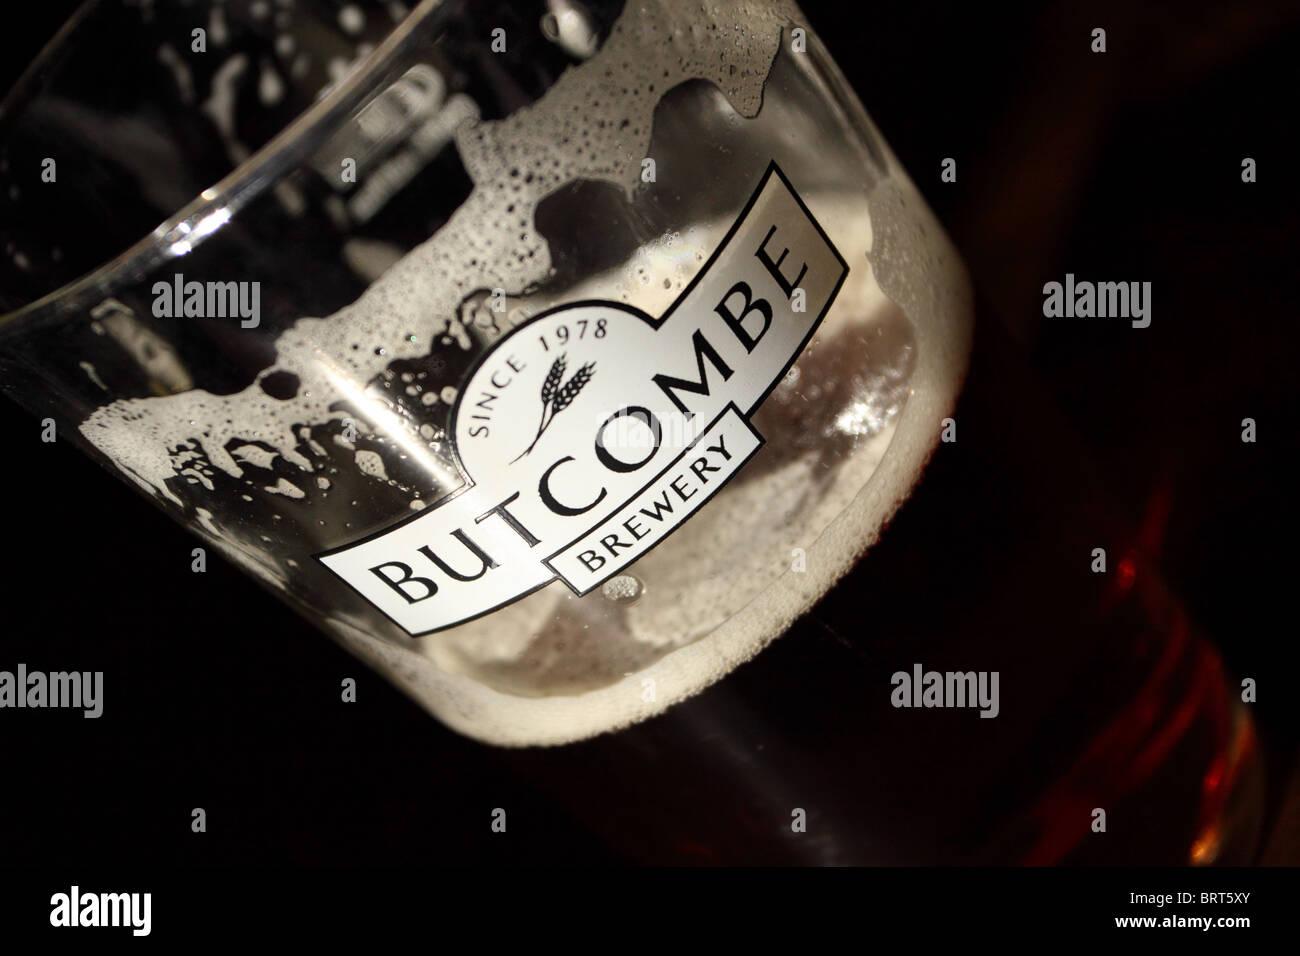 Butcombe Brewery beer glass half full local Somerset bitter beer - Stock Image